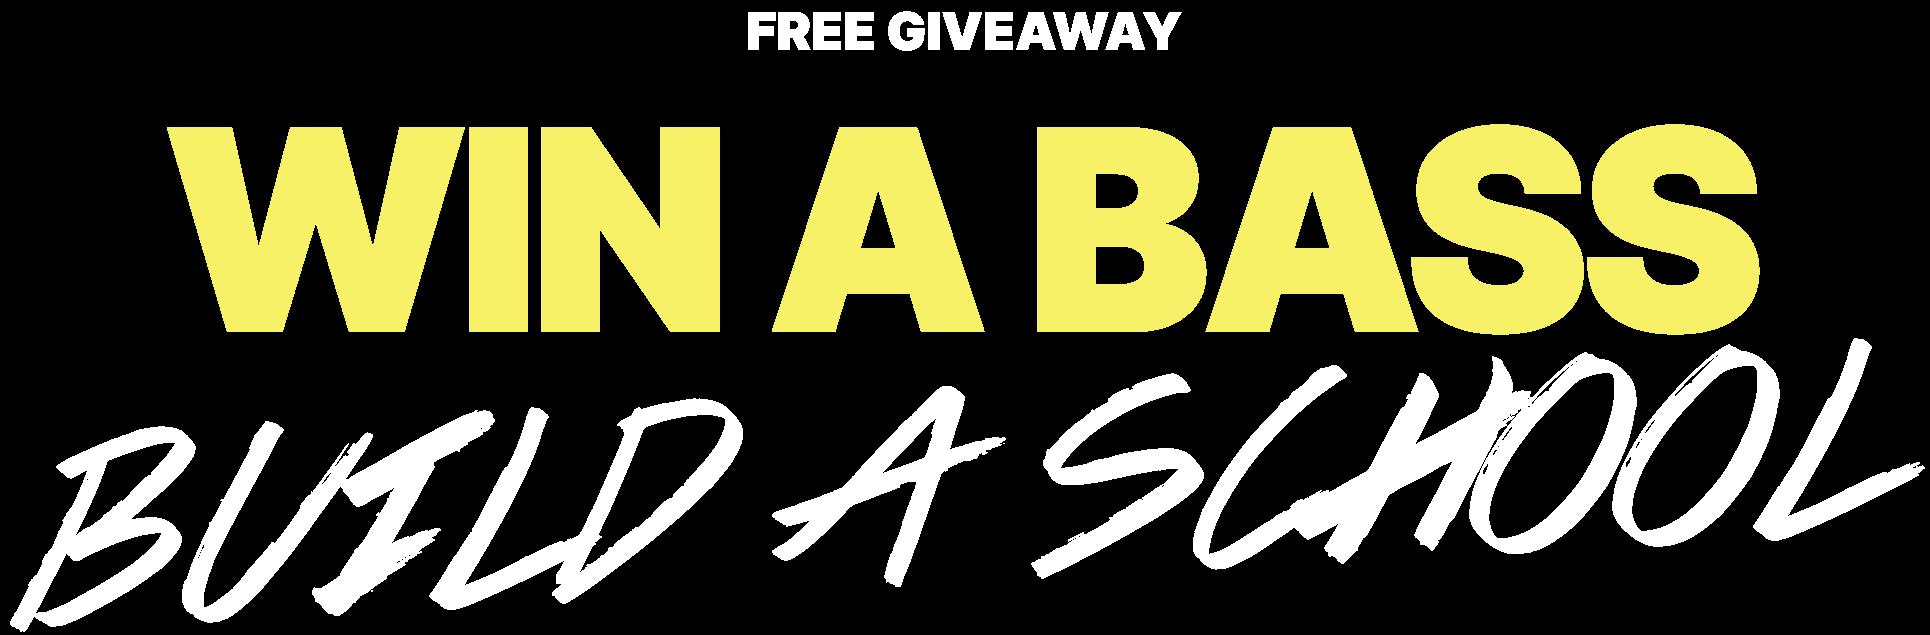 Giveaway - Win a bass, build a school